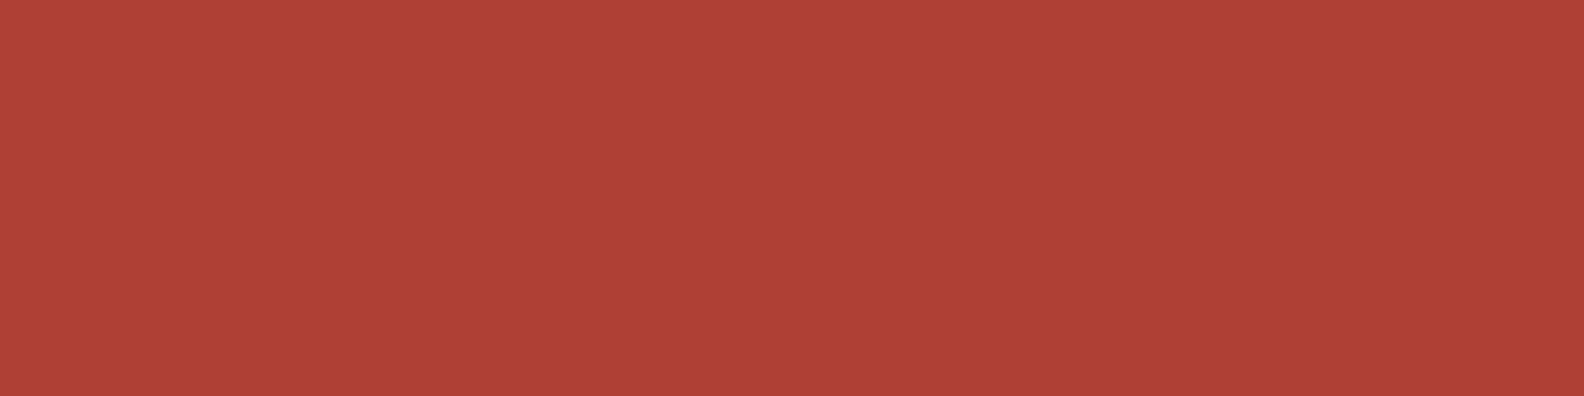 1584x396 Pale Carmine Solid Color Background